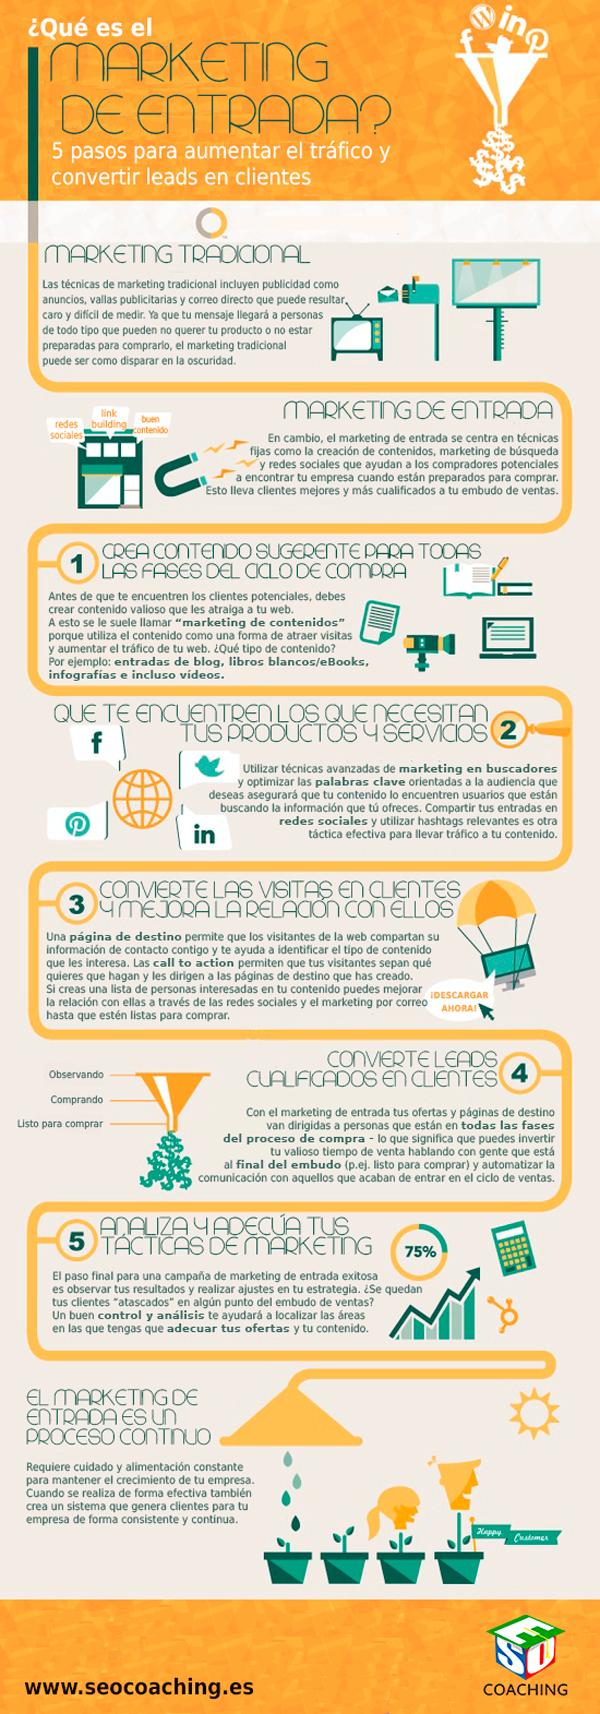 Qué es el Inbound Marketing #infografia #infographic #marketing